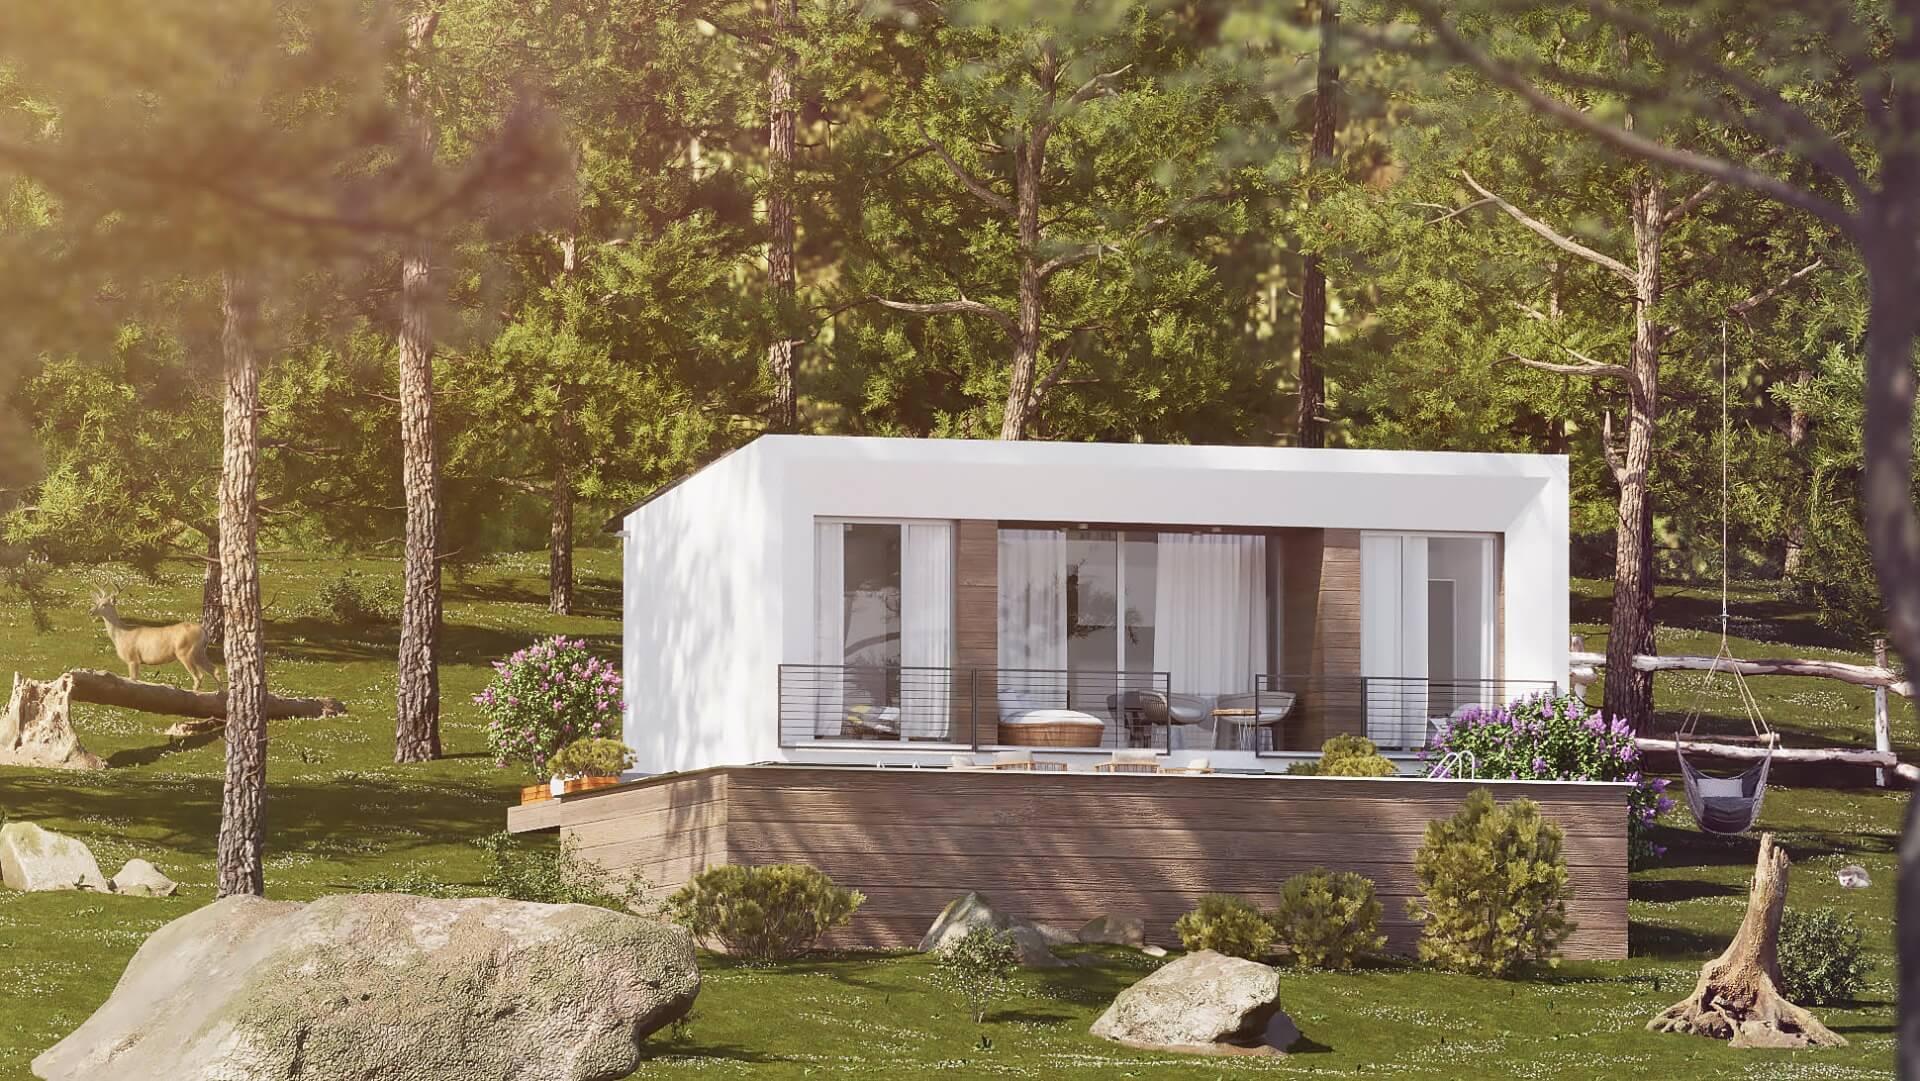 Apartmanska kuća - Renew Concept